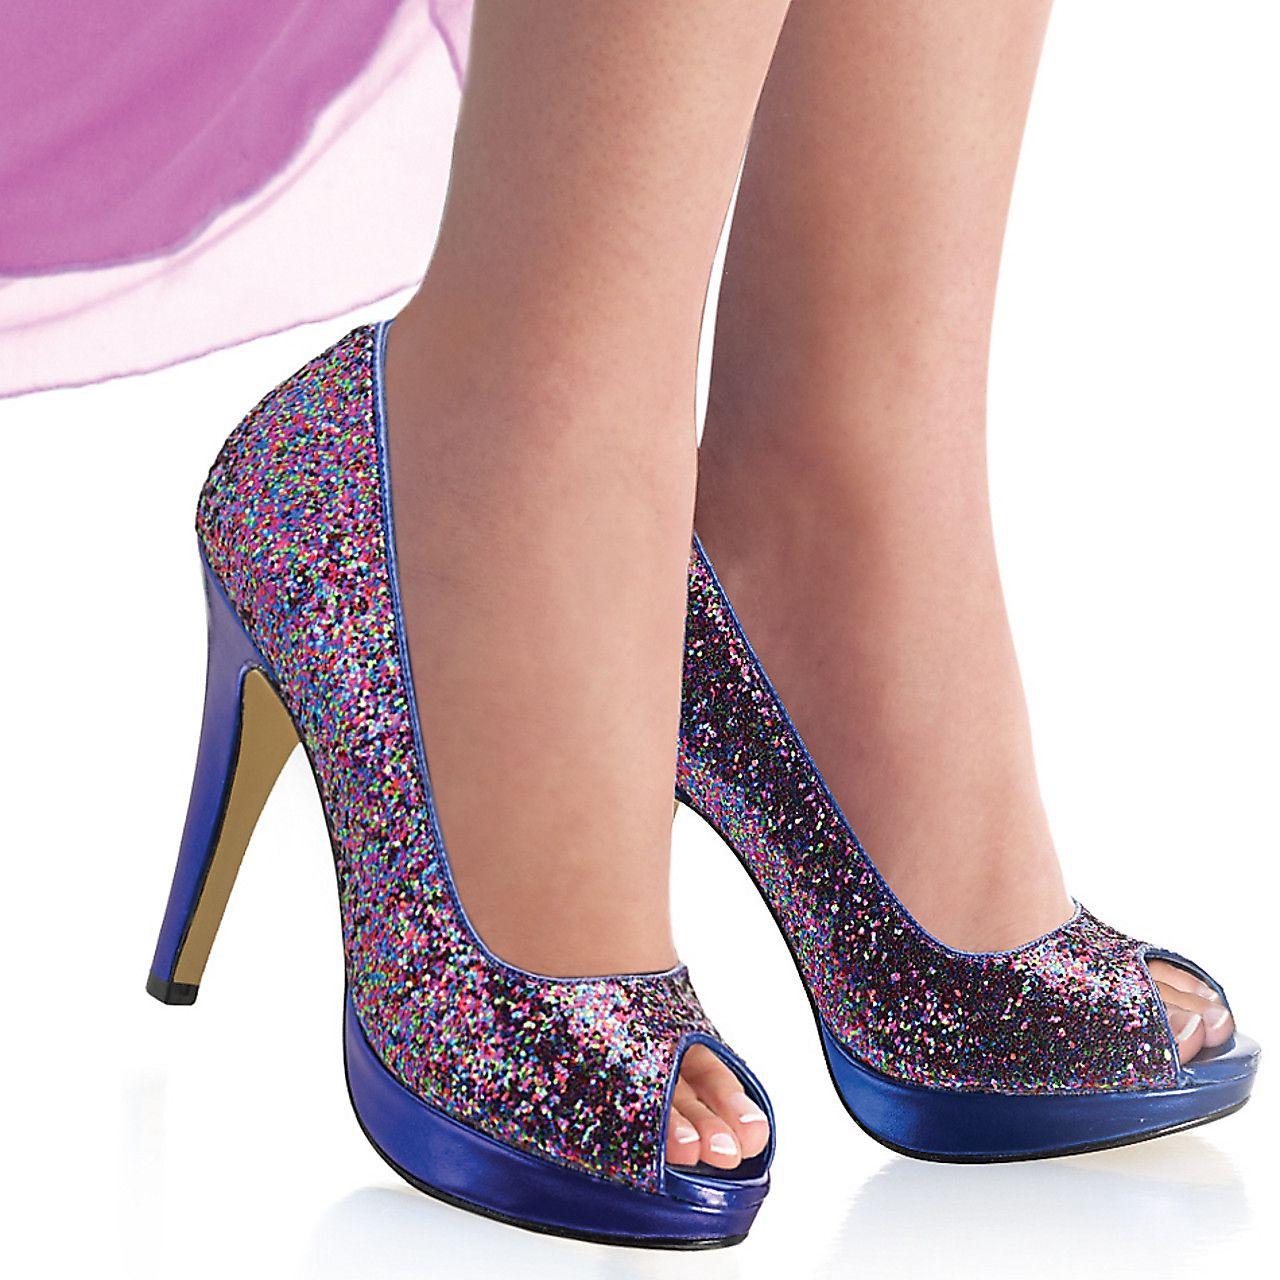 Rainbow glitter shoes!